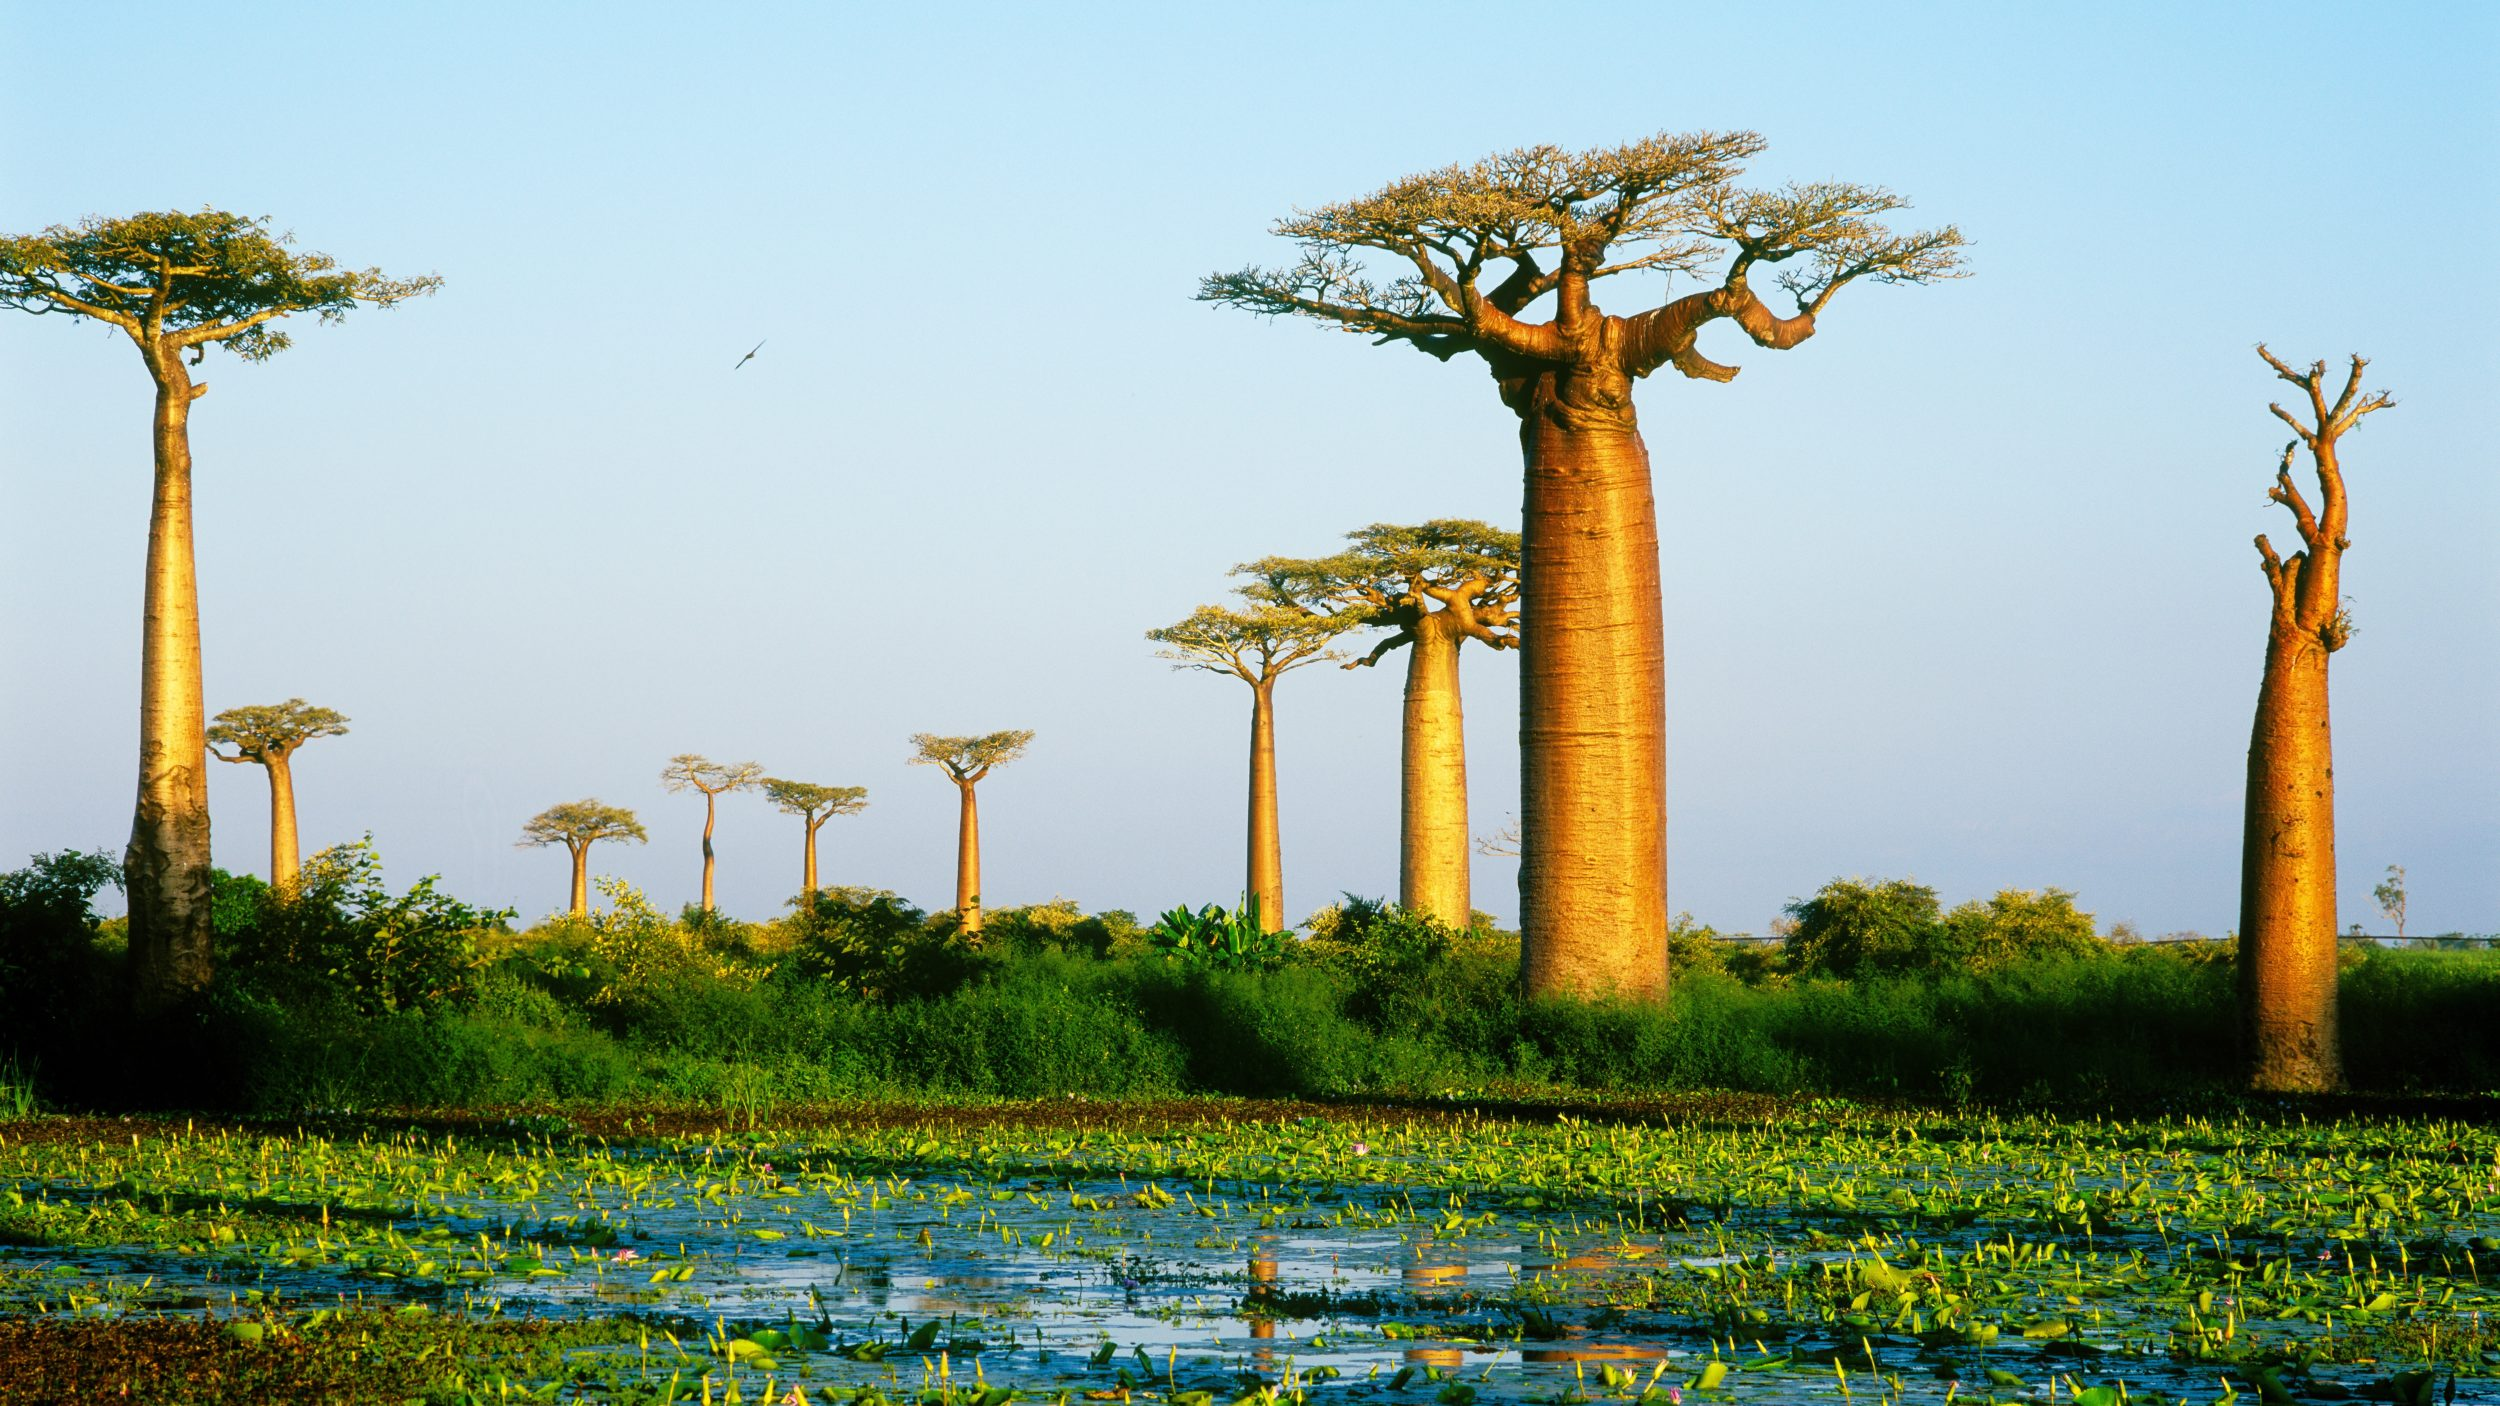 Madagascar [shutterstock]